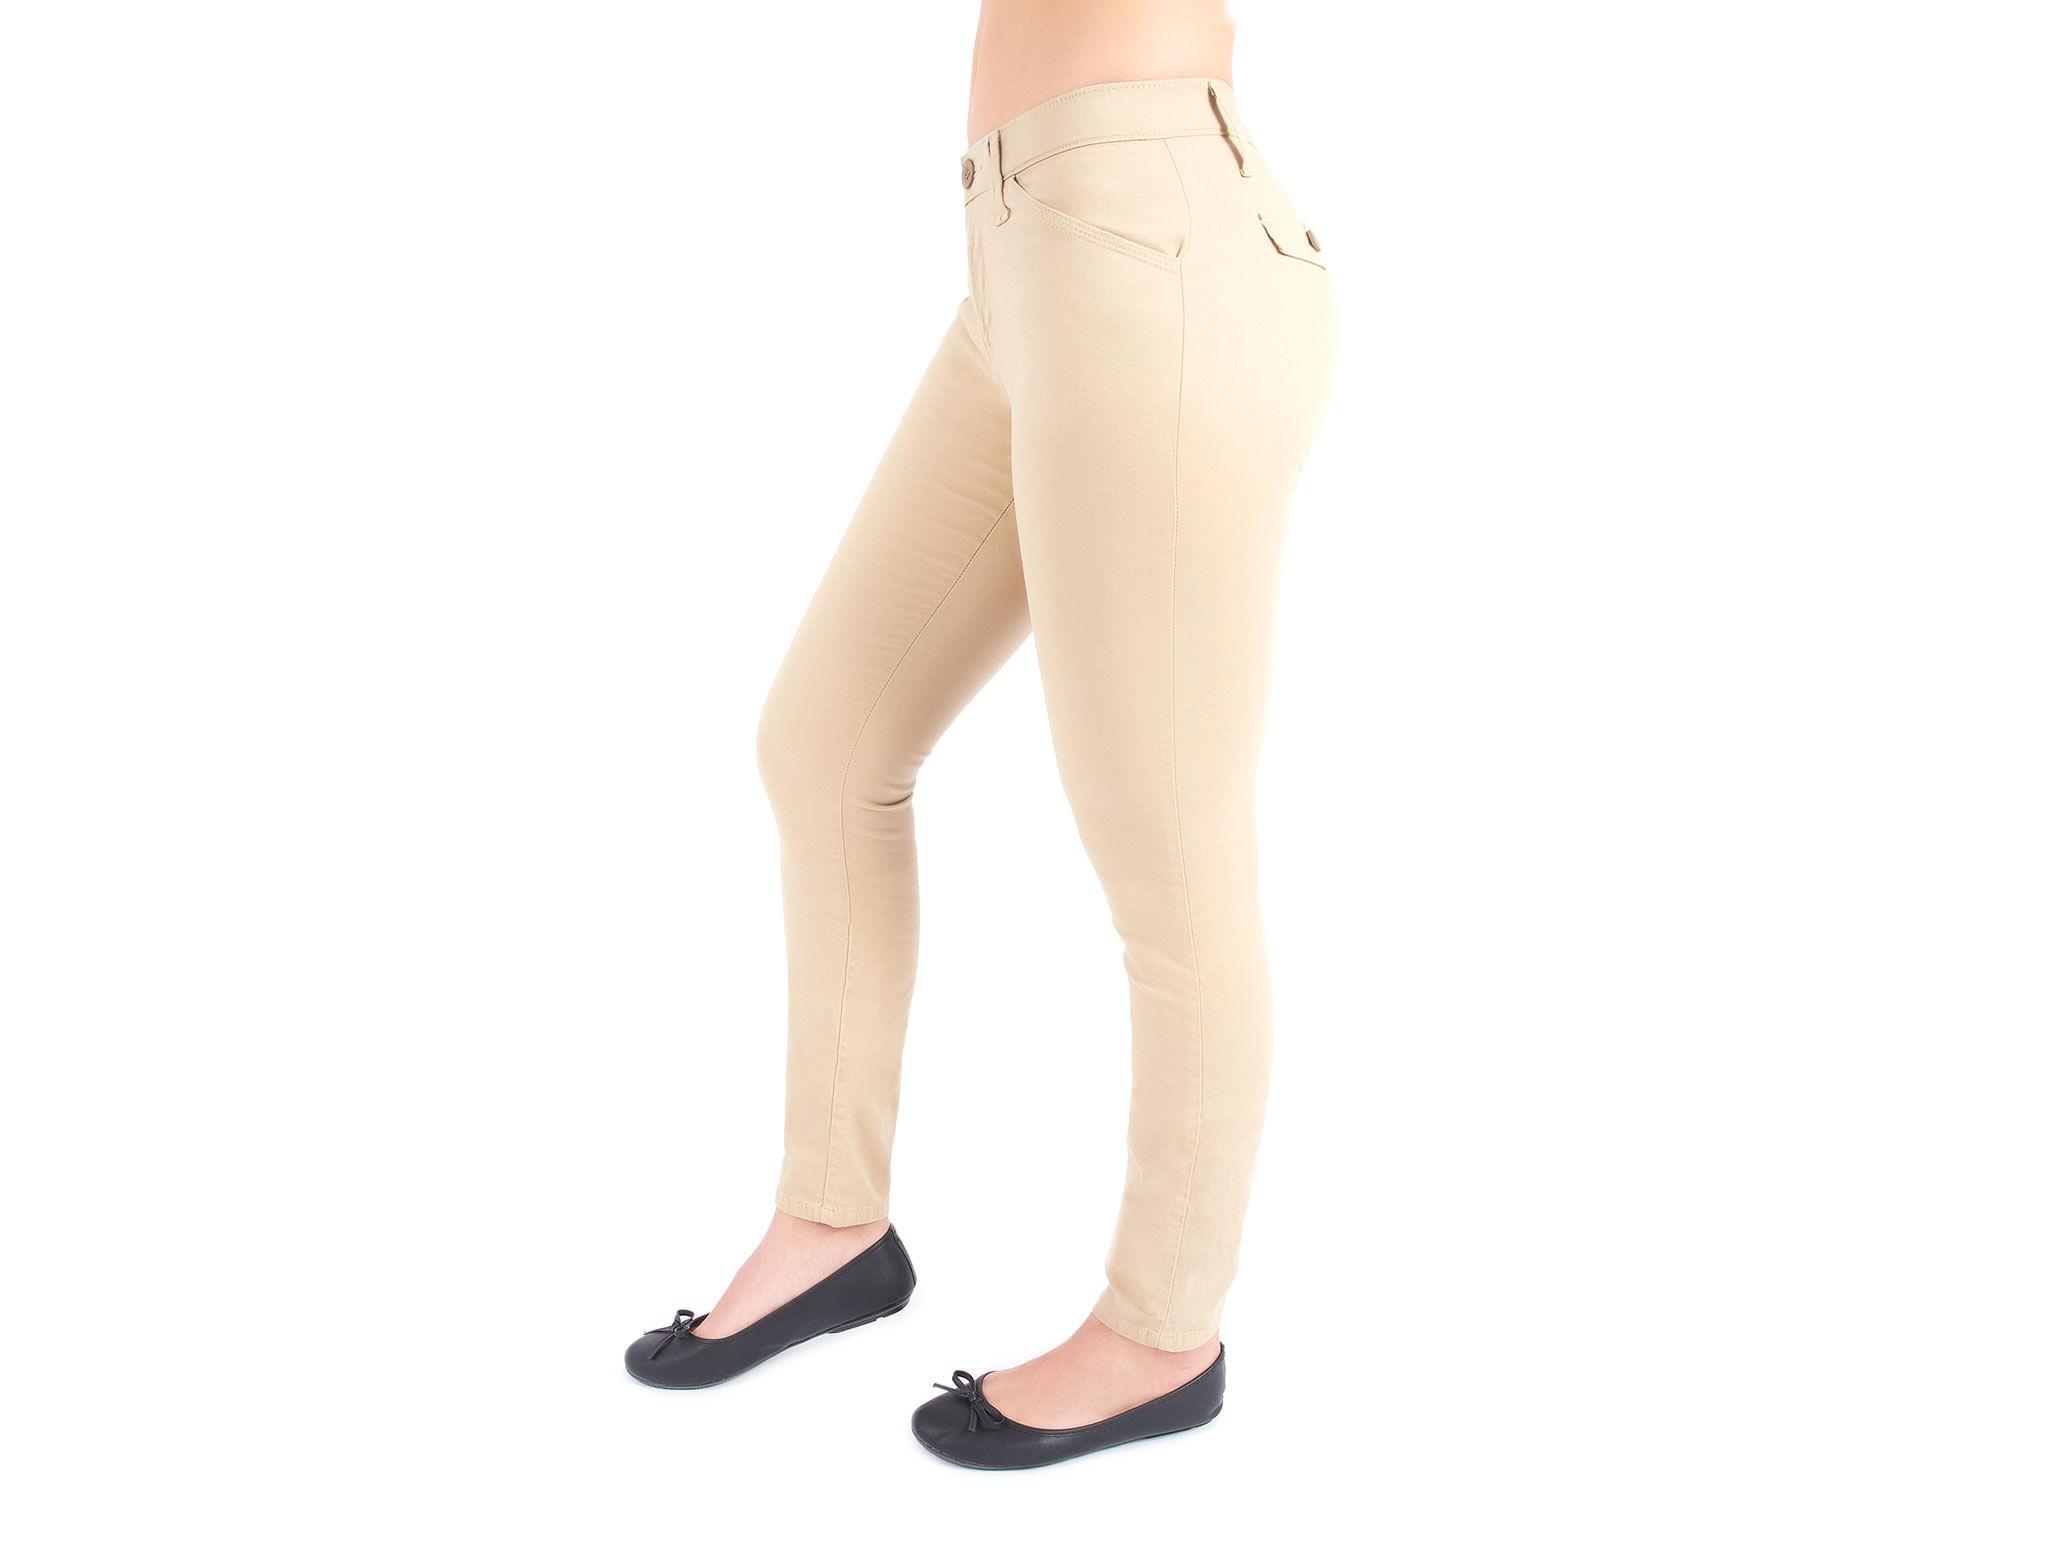 Pantalon Lee Casual Sport Gabardina Para Mujer 63 533 Ha16 Surtidoradepartamental